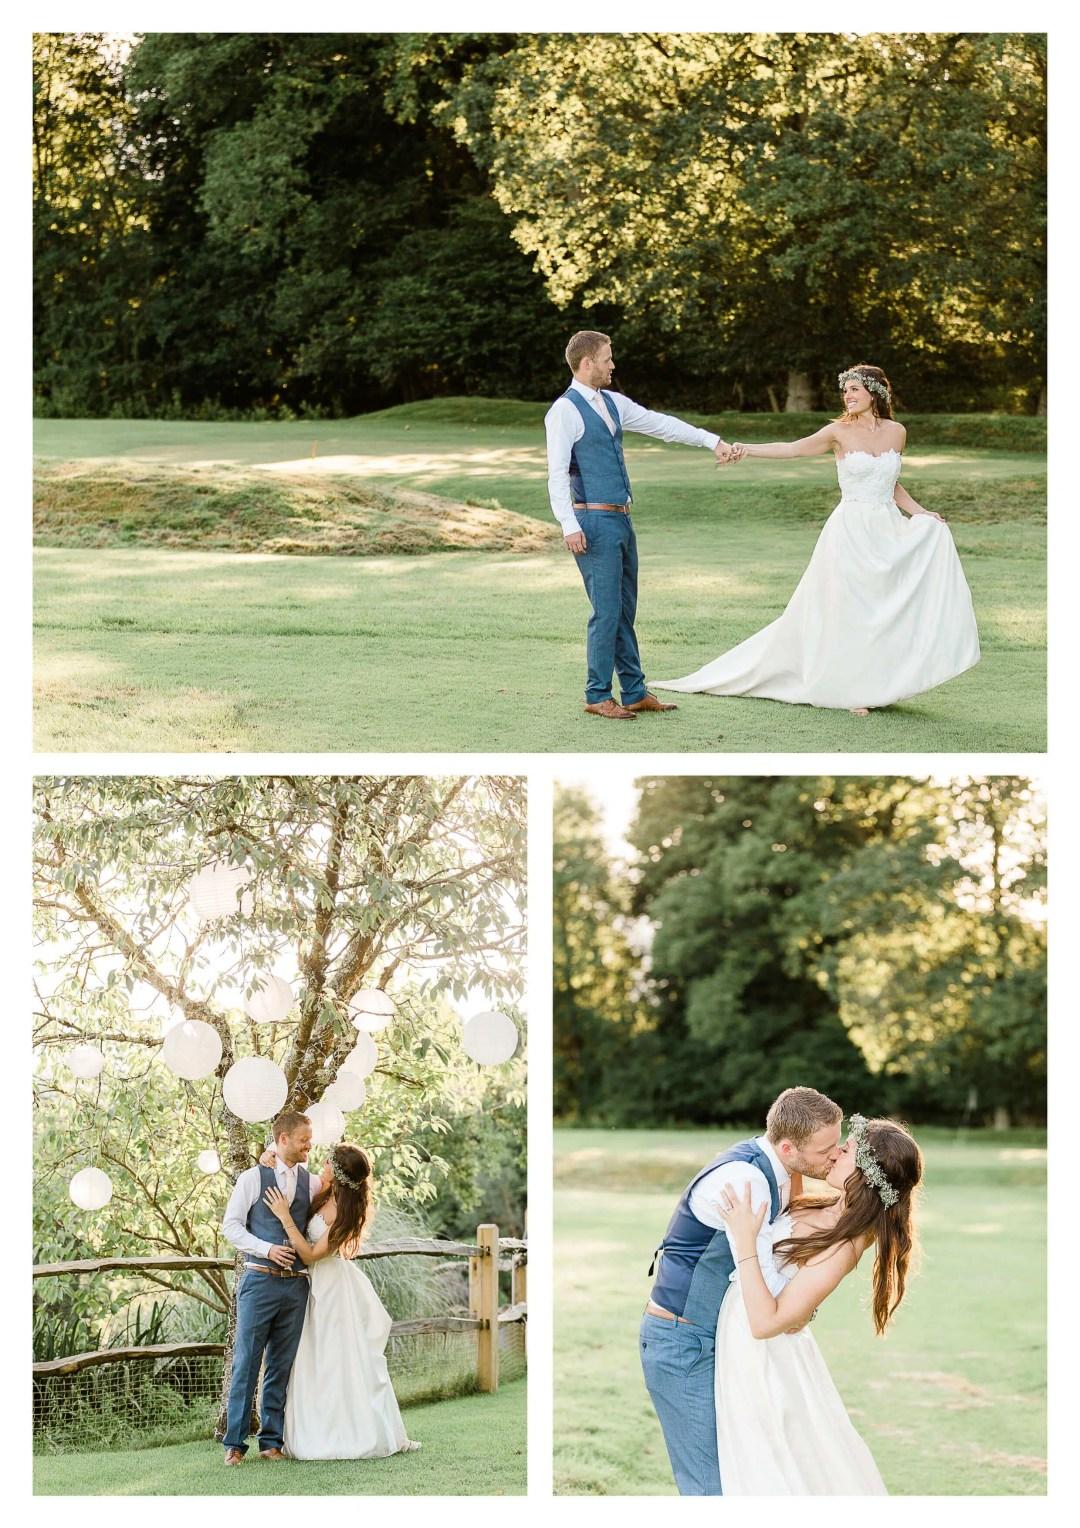 Brookfield Barn wedding photography on golf course | Horsham photographer